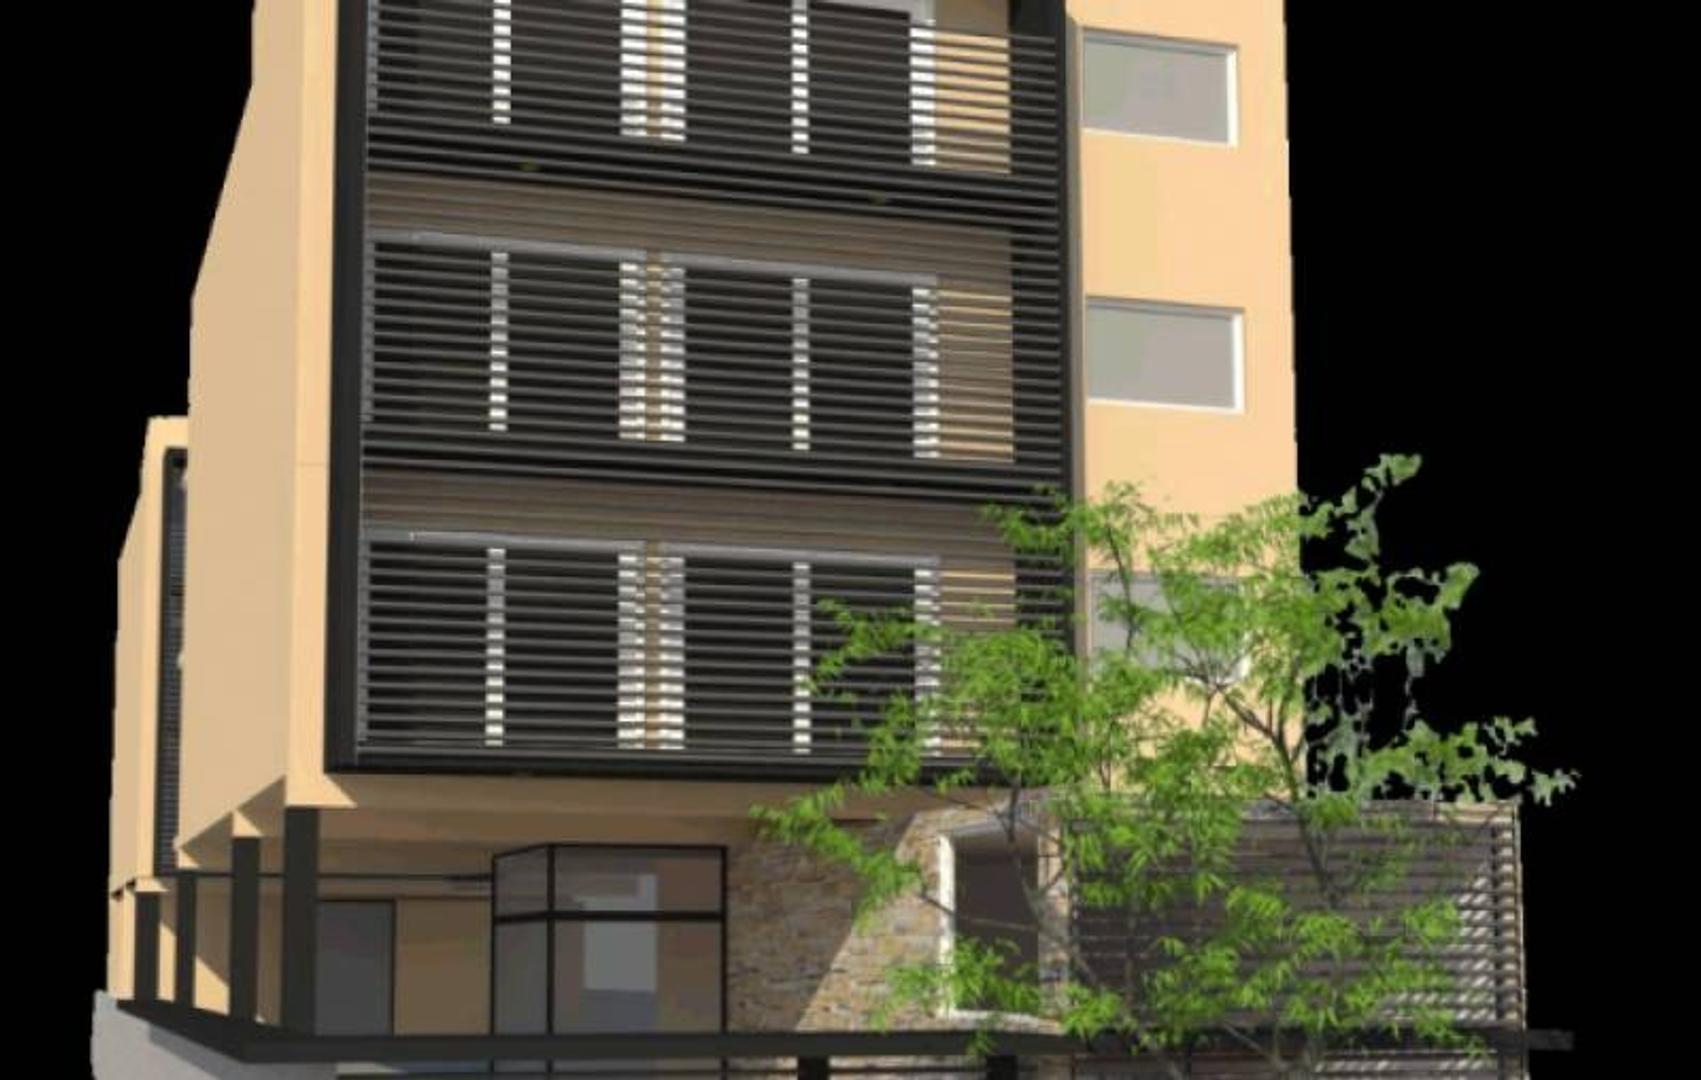 Departamento Monoambiente Villa Ballester - A estrenar Entrega Abril 2018